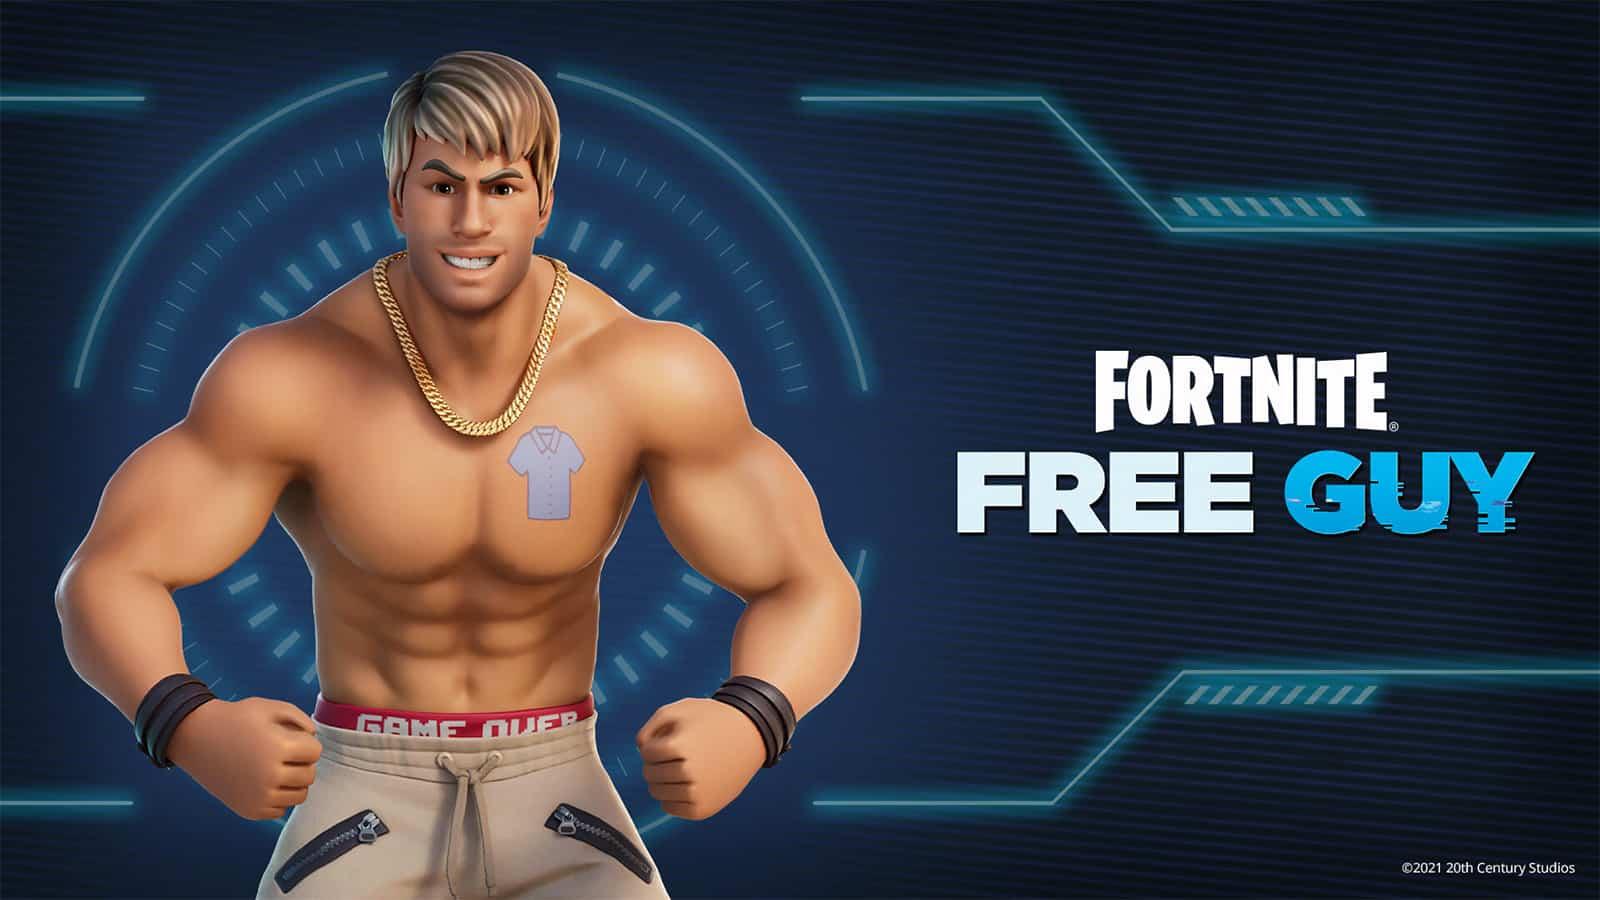 Fortnite Free Guy Ryan Reynolds